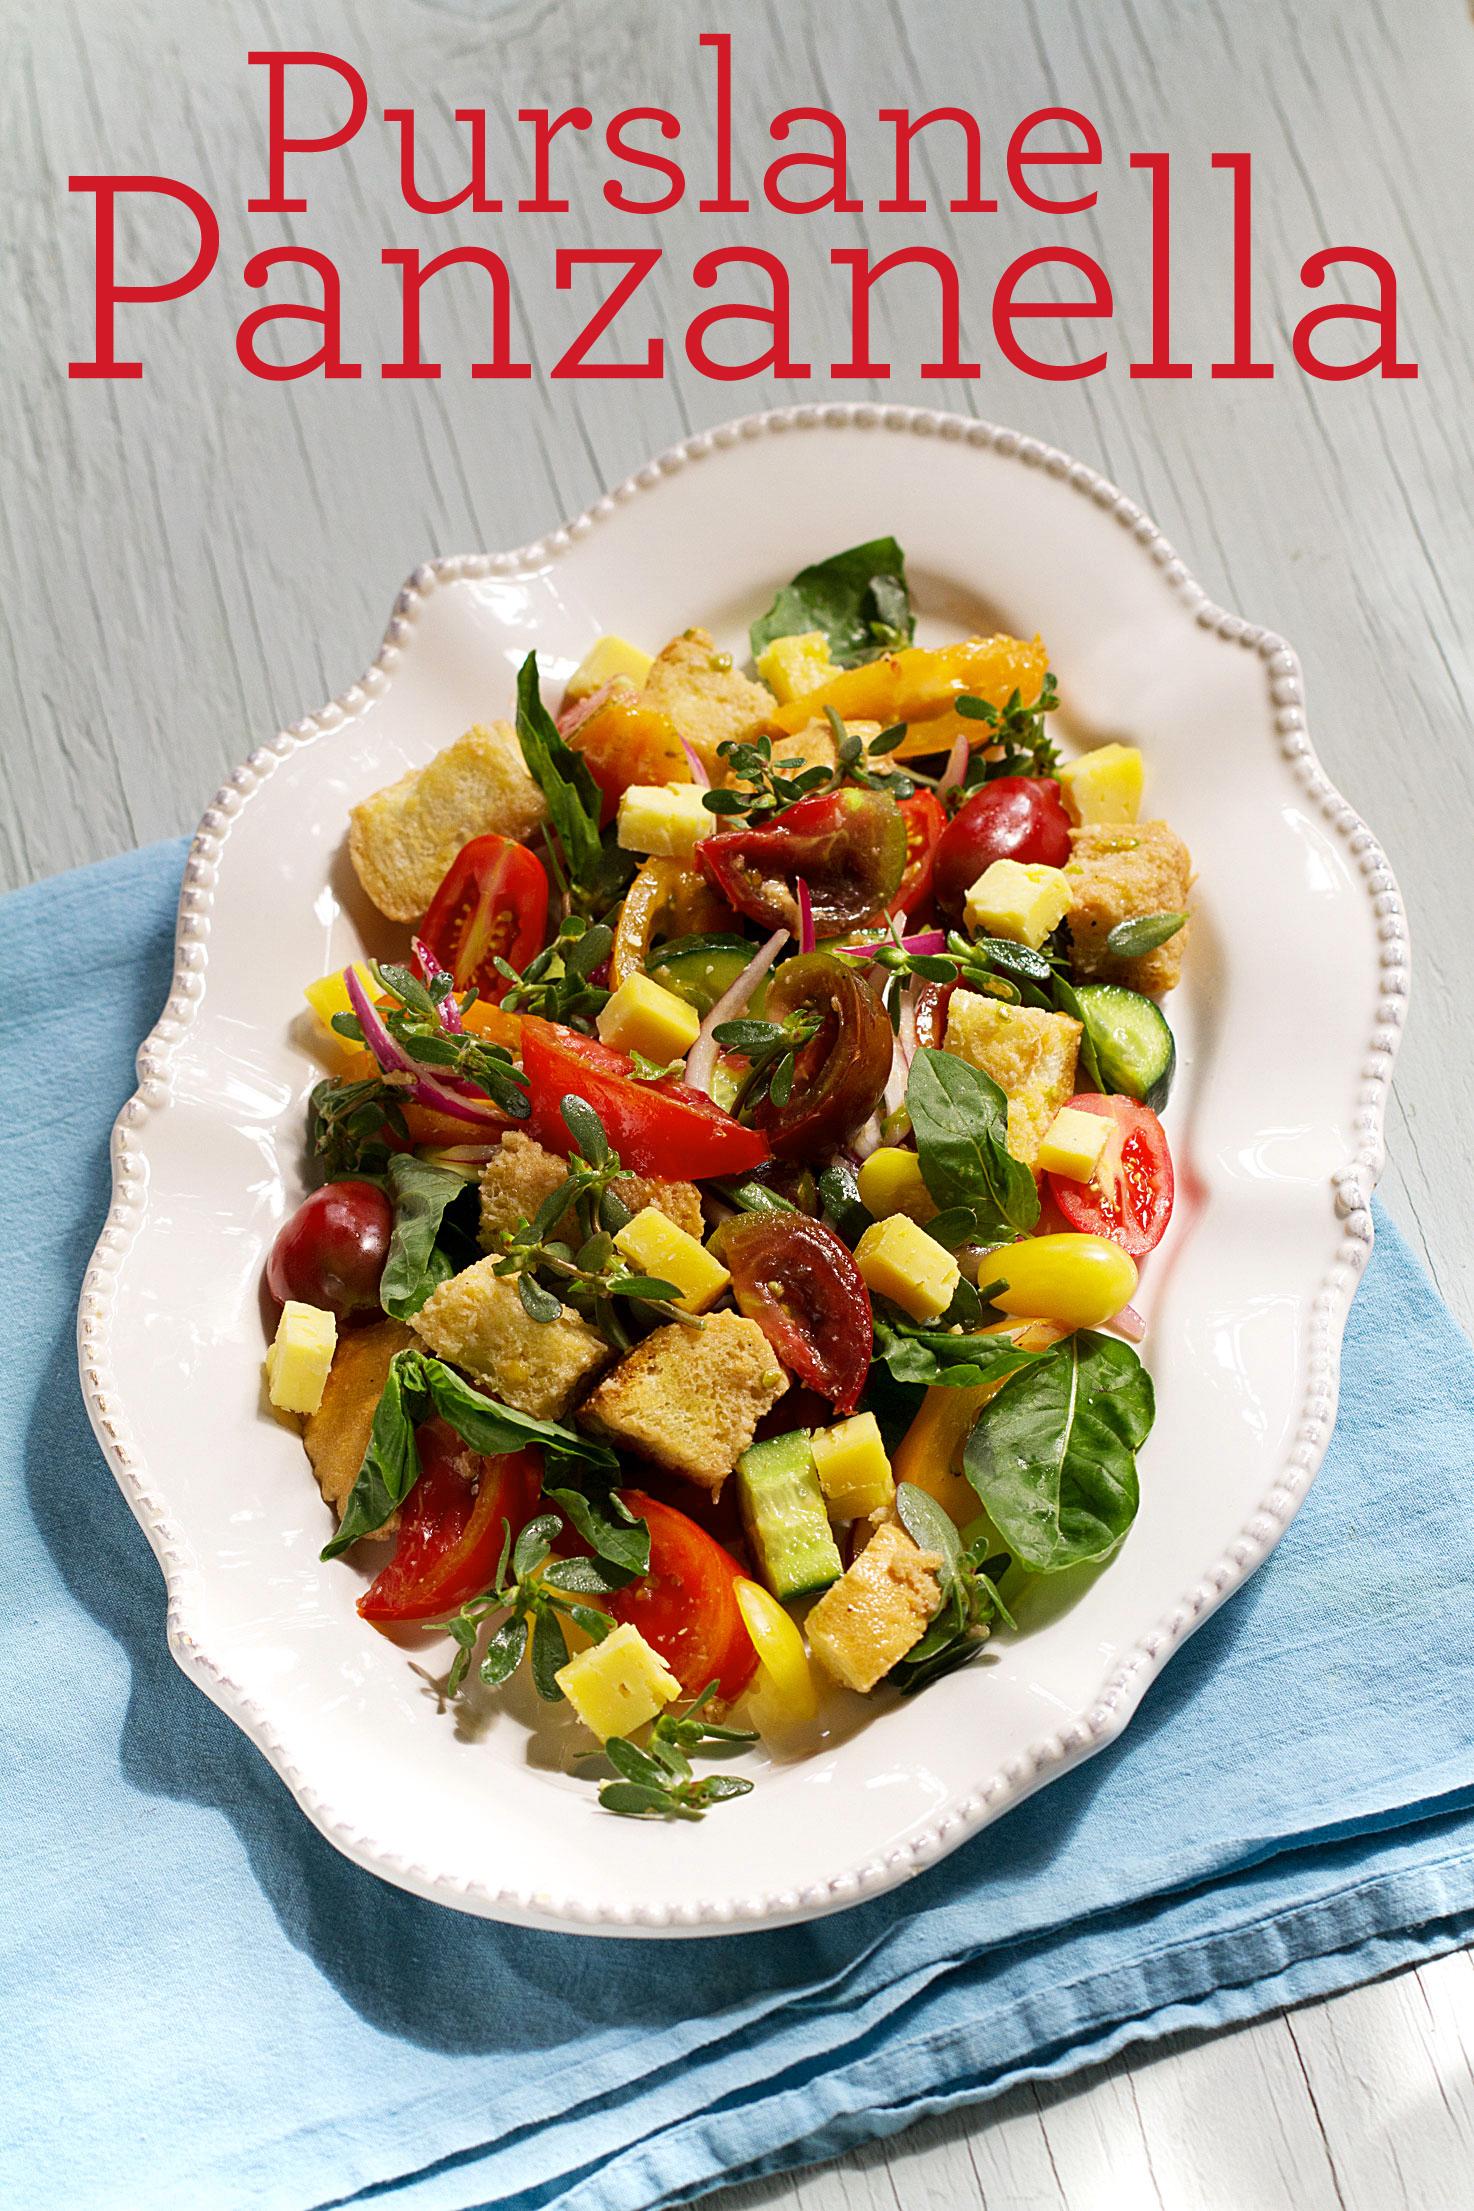 Purslane Panzanella Salad (Italian Bread Salad)